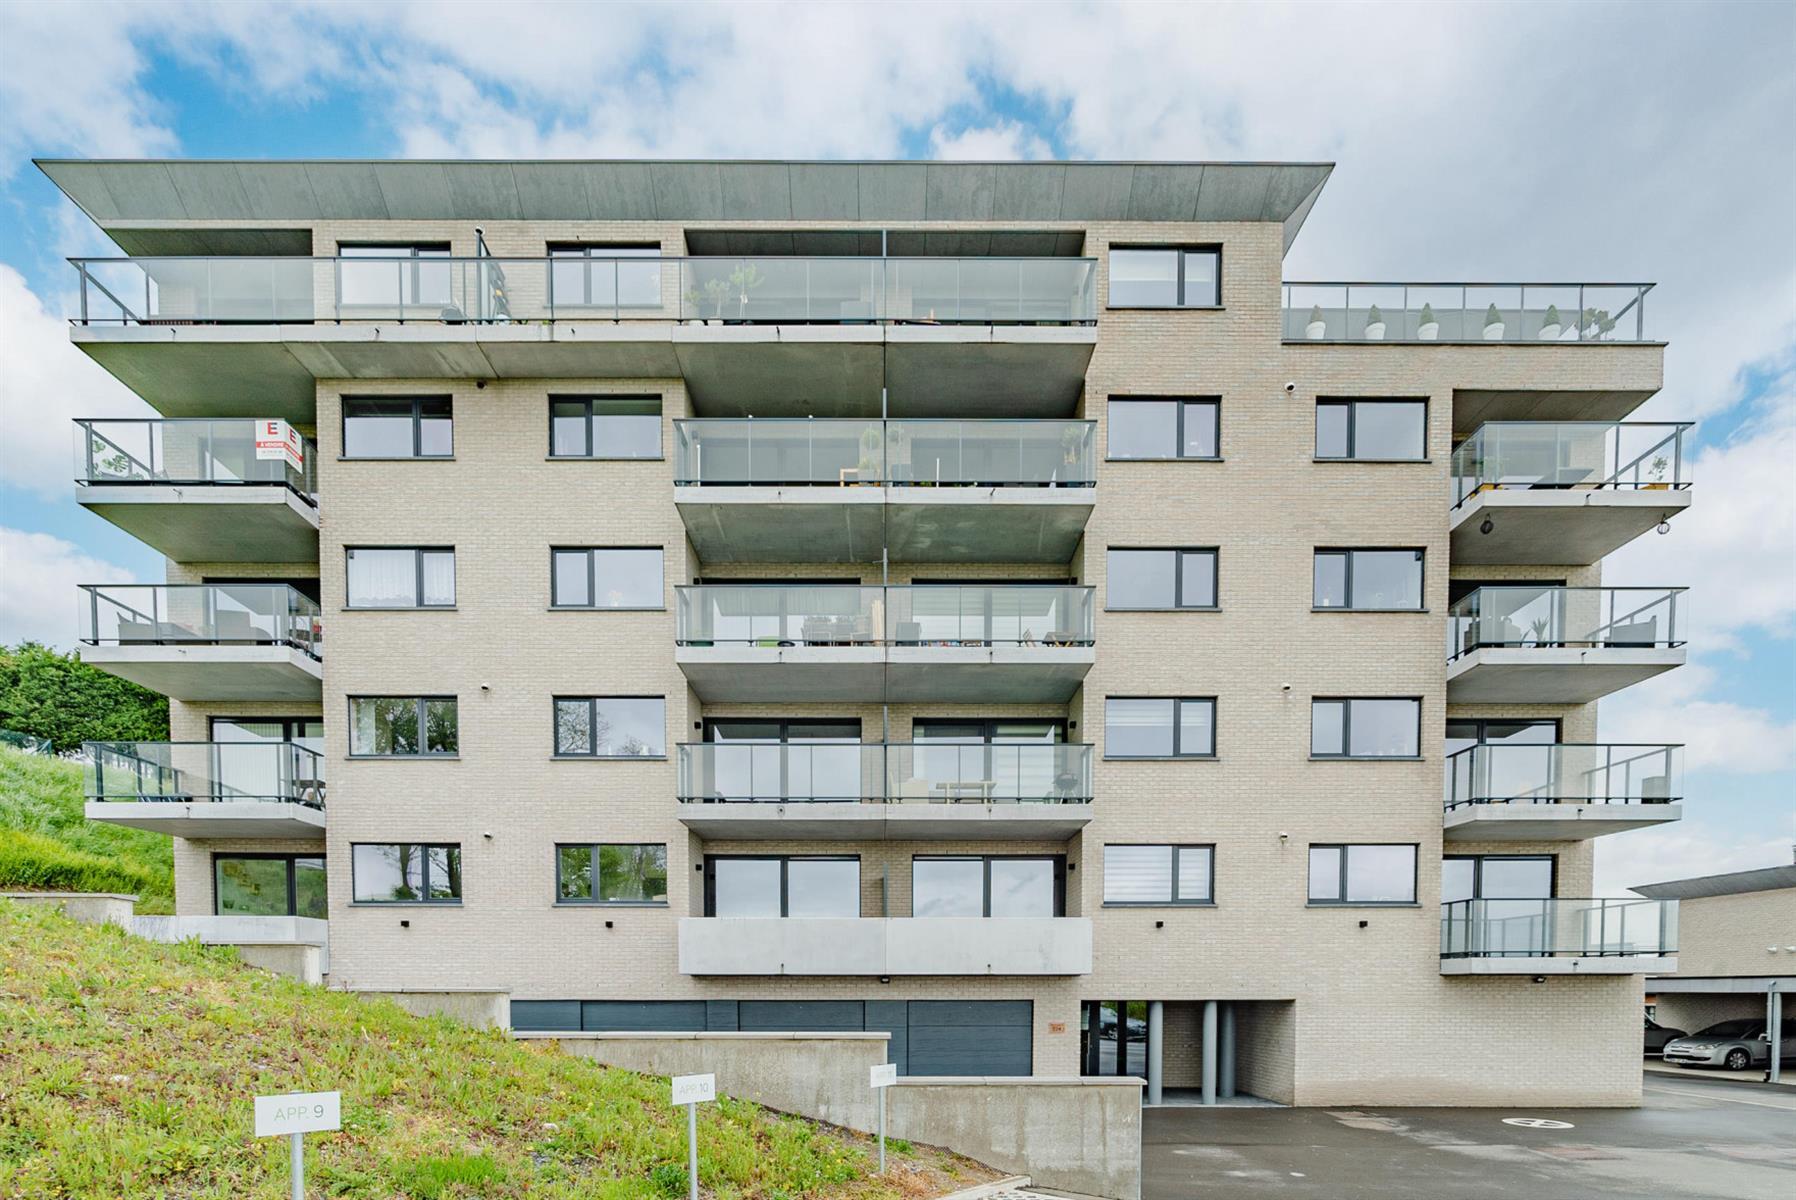 Appartement - Grâce-hollogne - #4364483-0